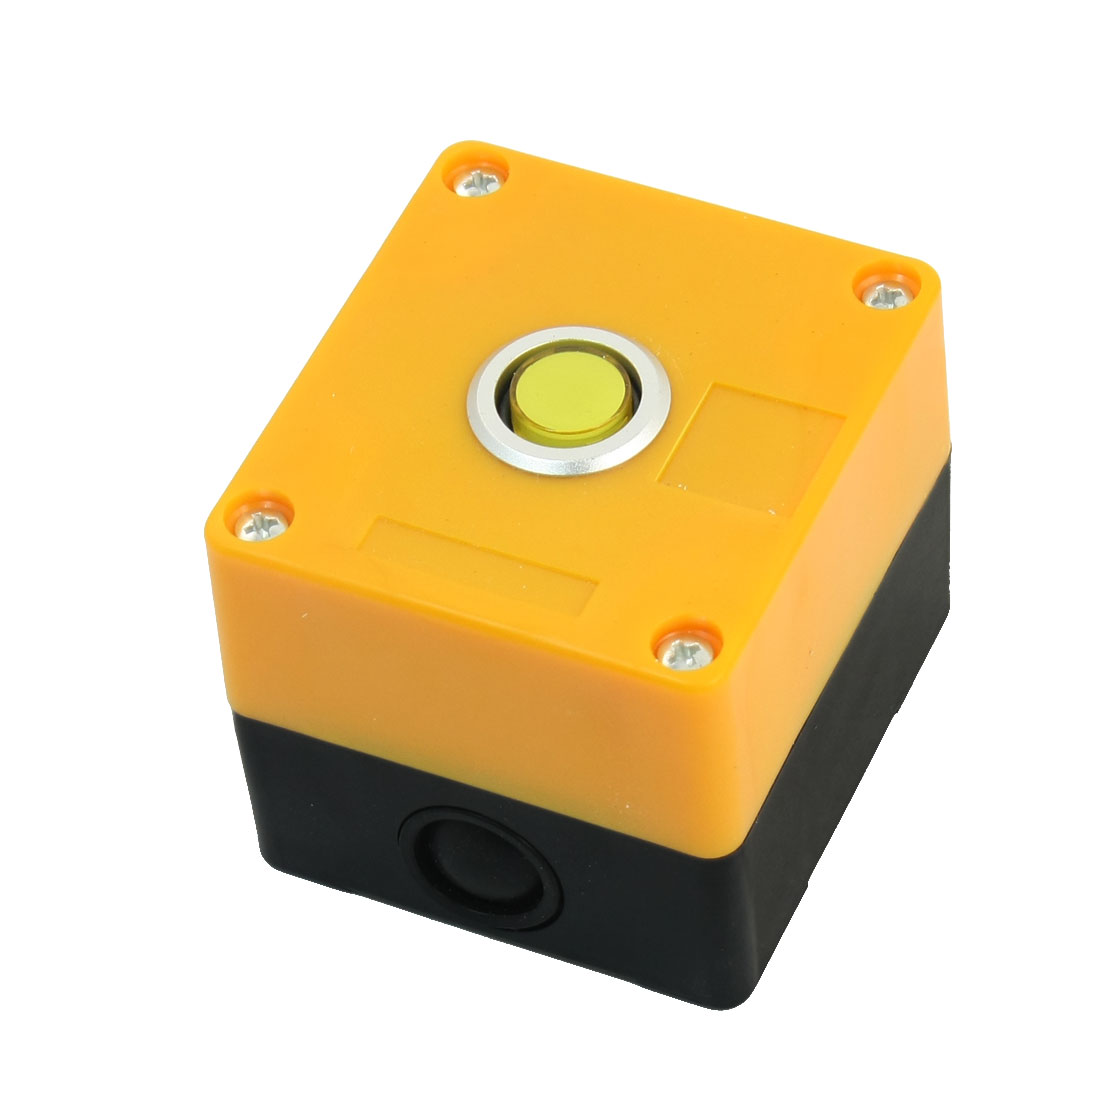 220V 15mm Dia Round Button Rectangle Plastic Case Yellow Signal Indicator Light Pilot Lamp Bulb Protector Box